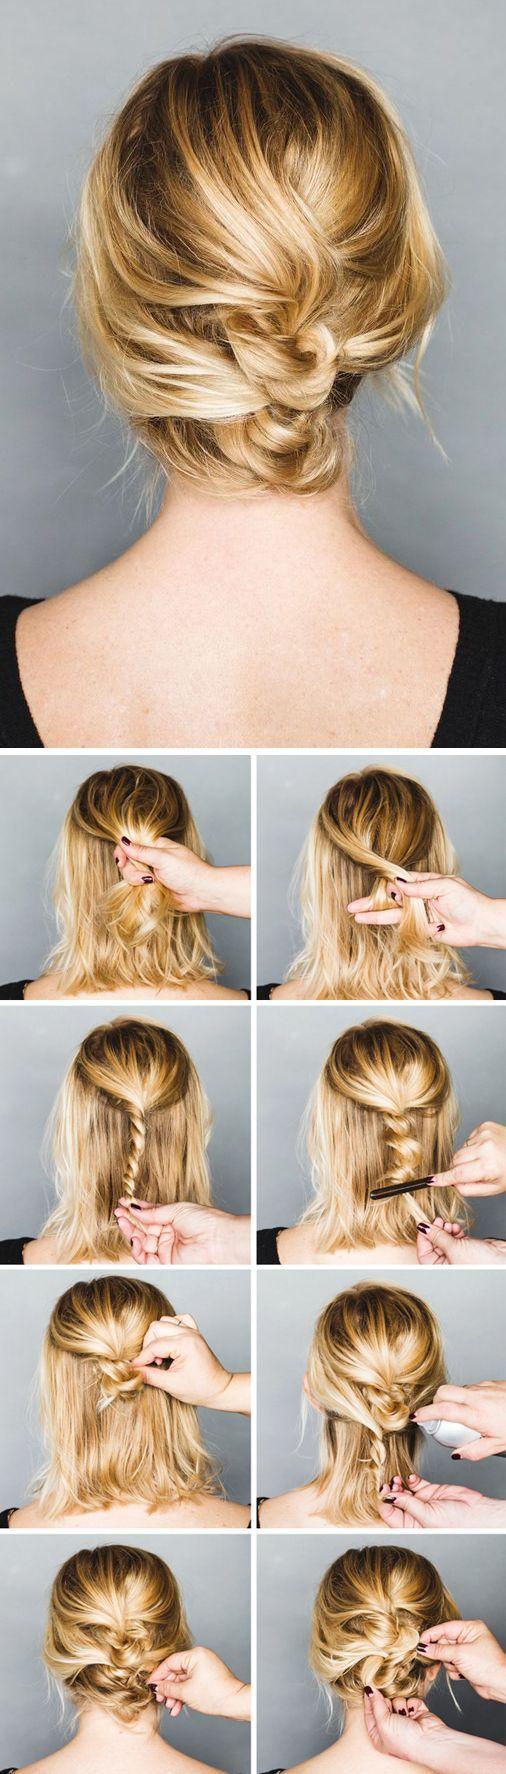 Magnificent 1000 Ideas About Short Hair Tutorials On Pinterest Long Hair Short Hairstyles Gunalazisus